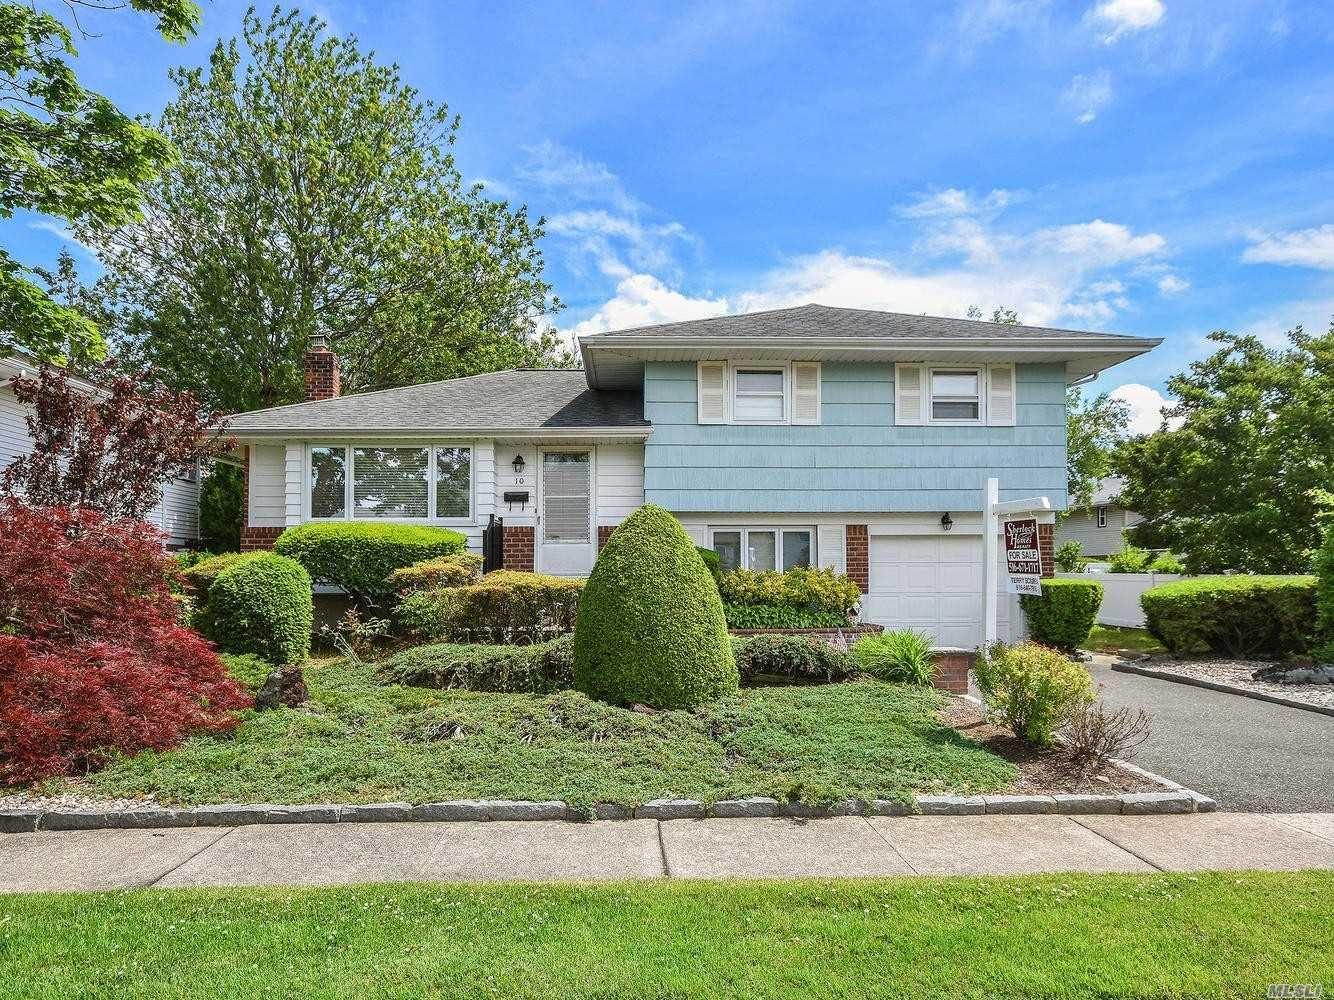 10 Lex Avenue, Plainview, NY 11803 - MLS#: 3220517